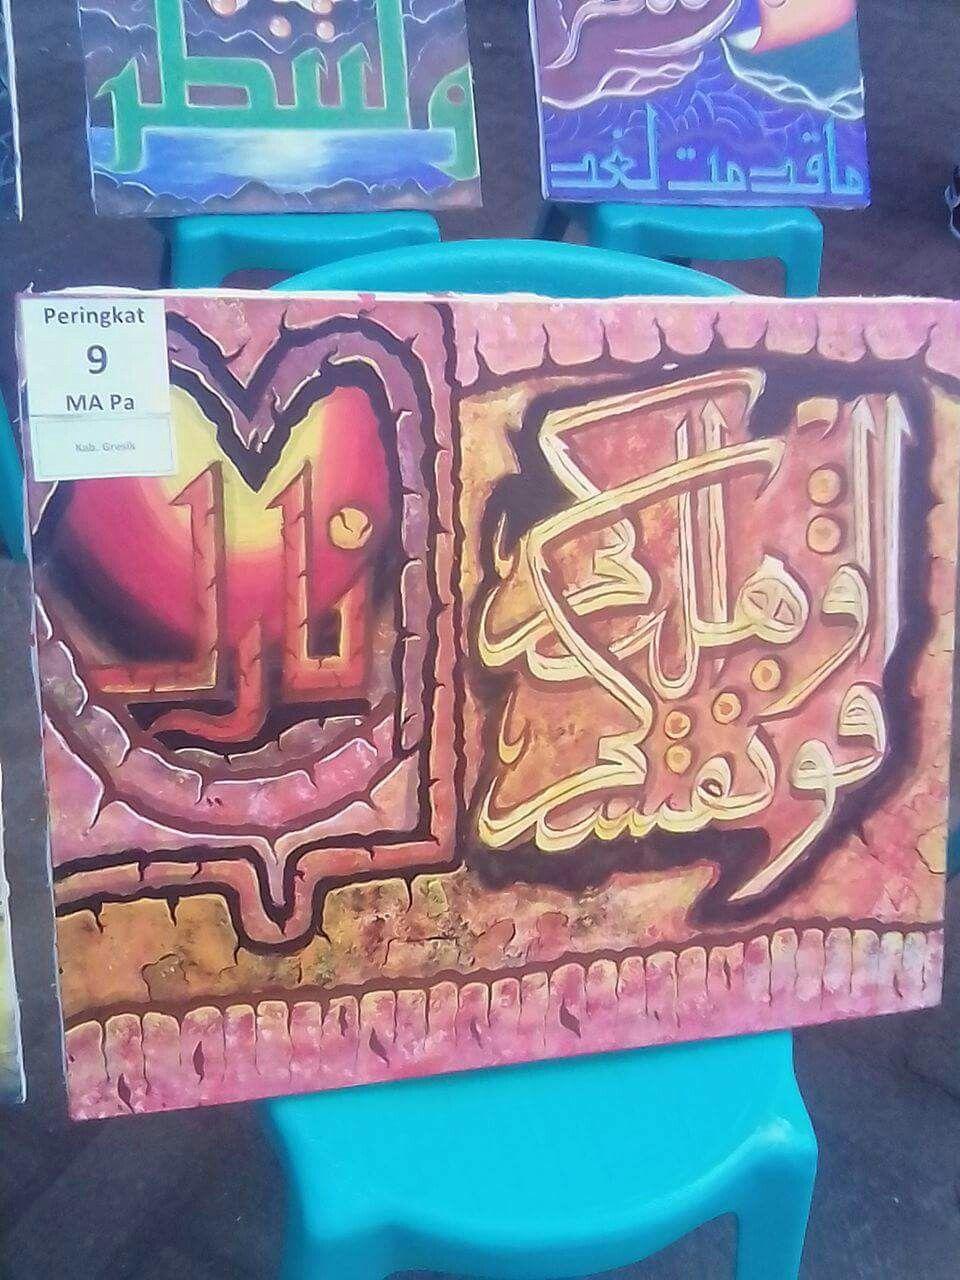 Gambar Kaligrafi oleh Mochamad Navik pada kaligrafi